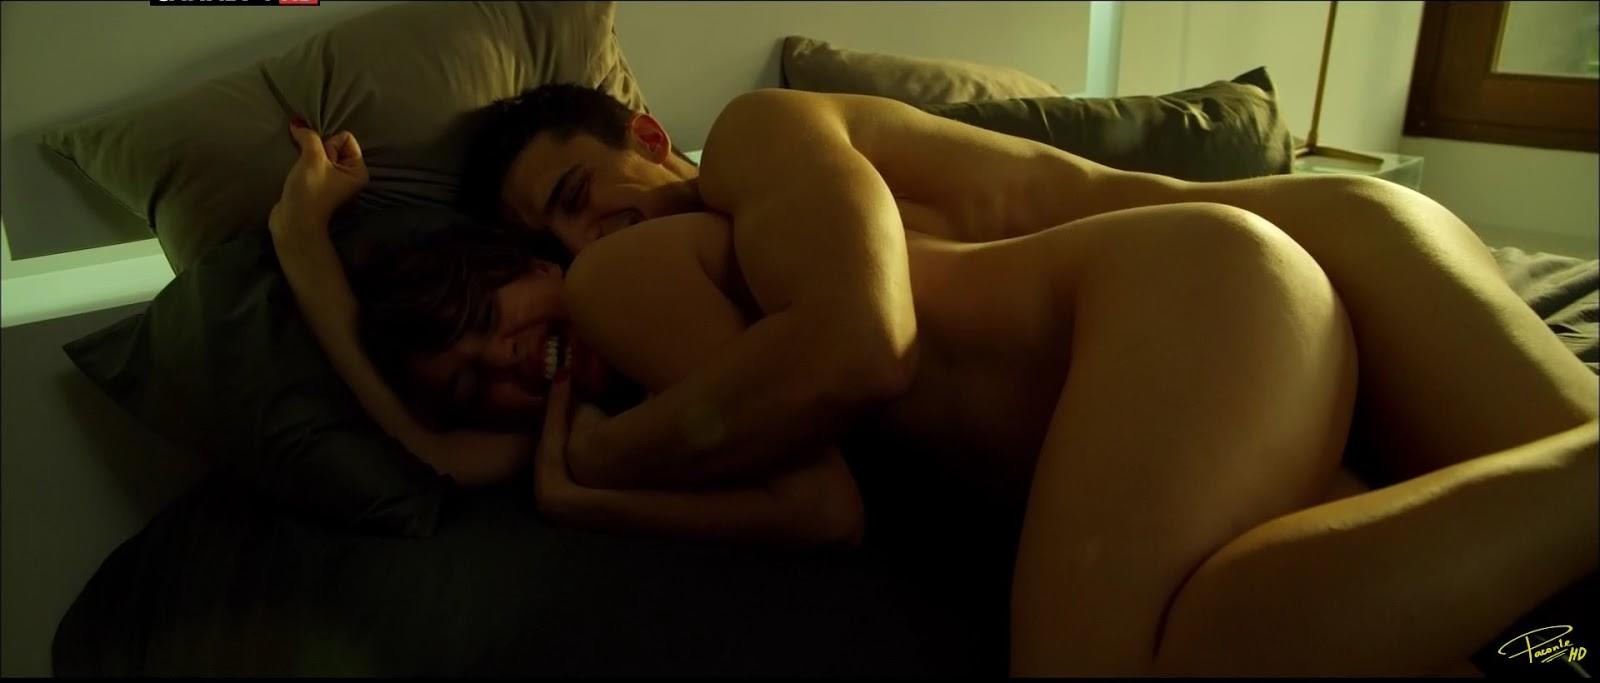 seksualnie-otrivki